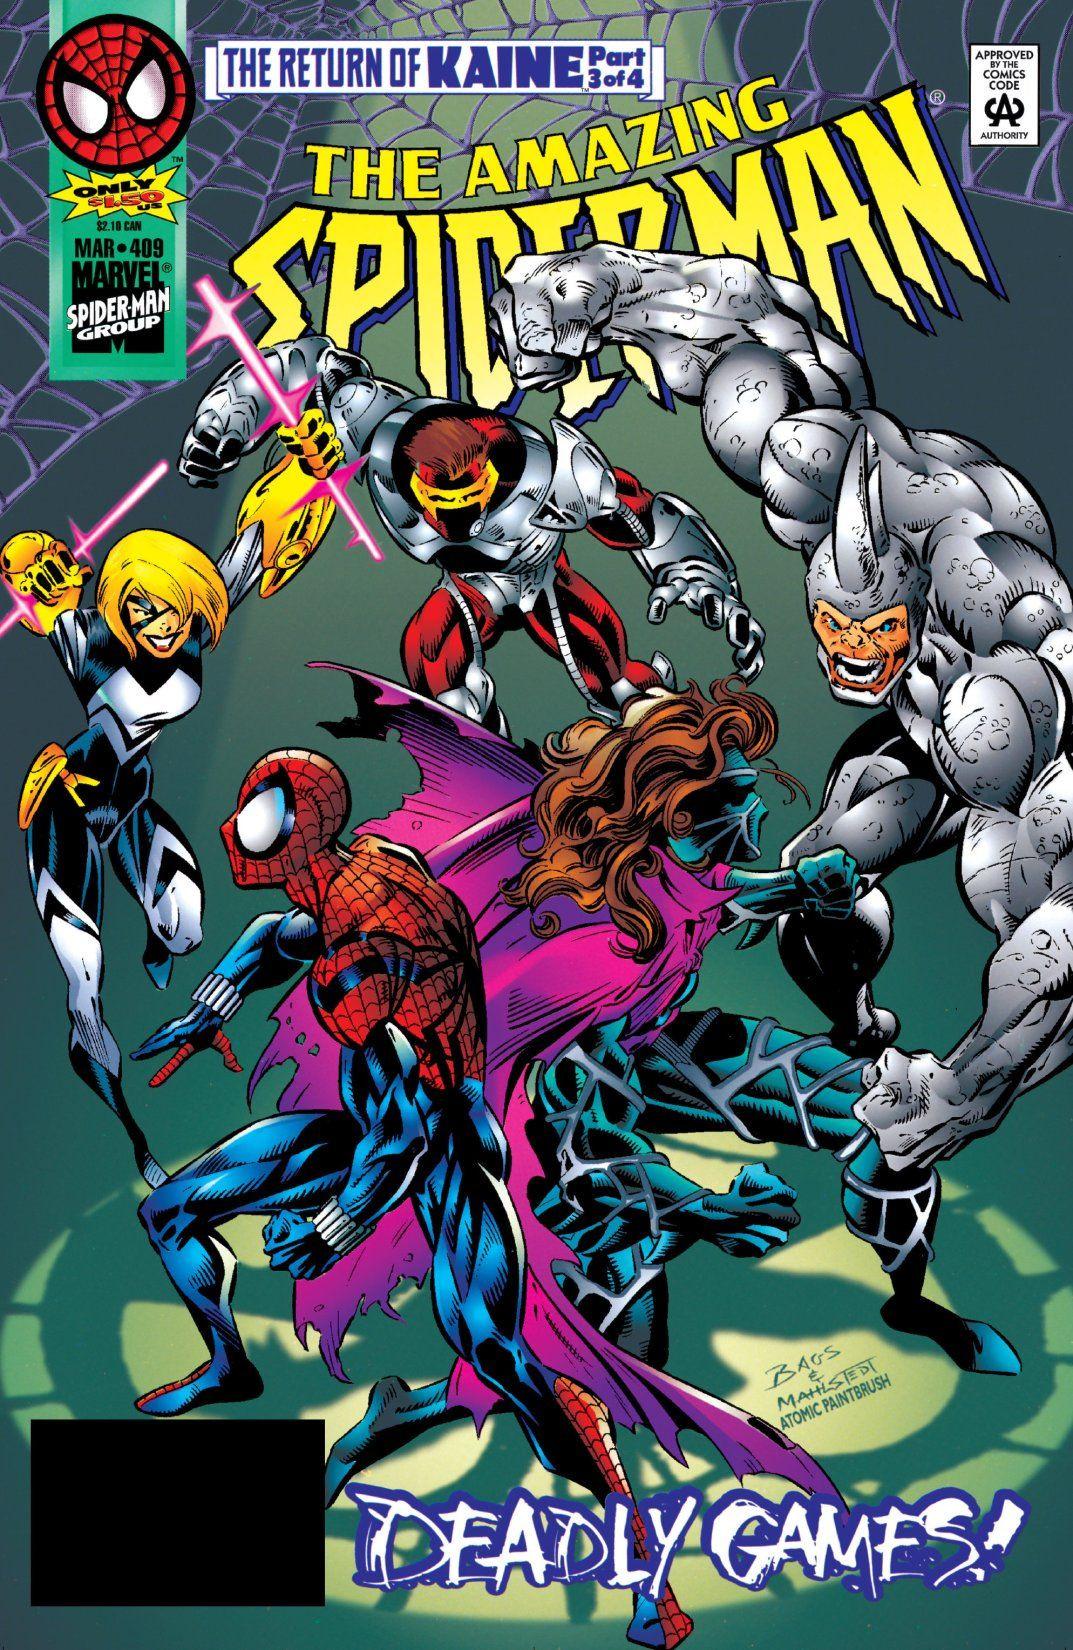 Spider-Man: The Complete Ben Reilly Epic Vol 1 3